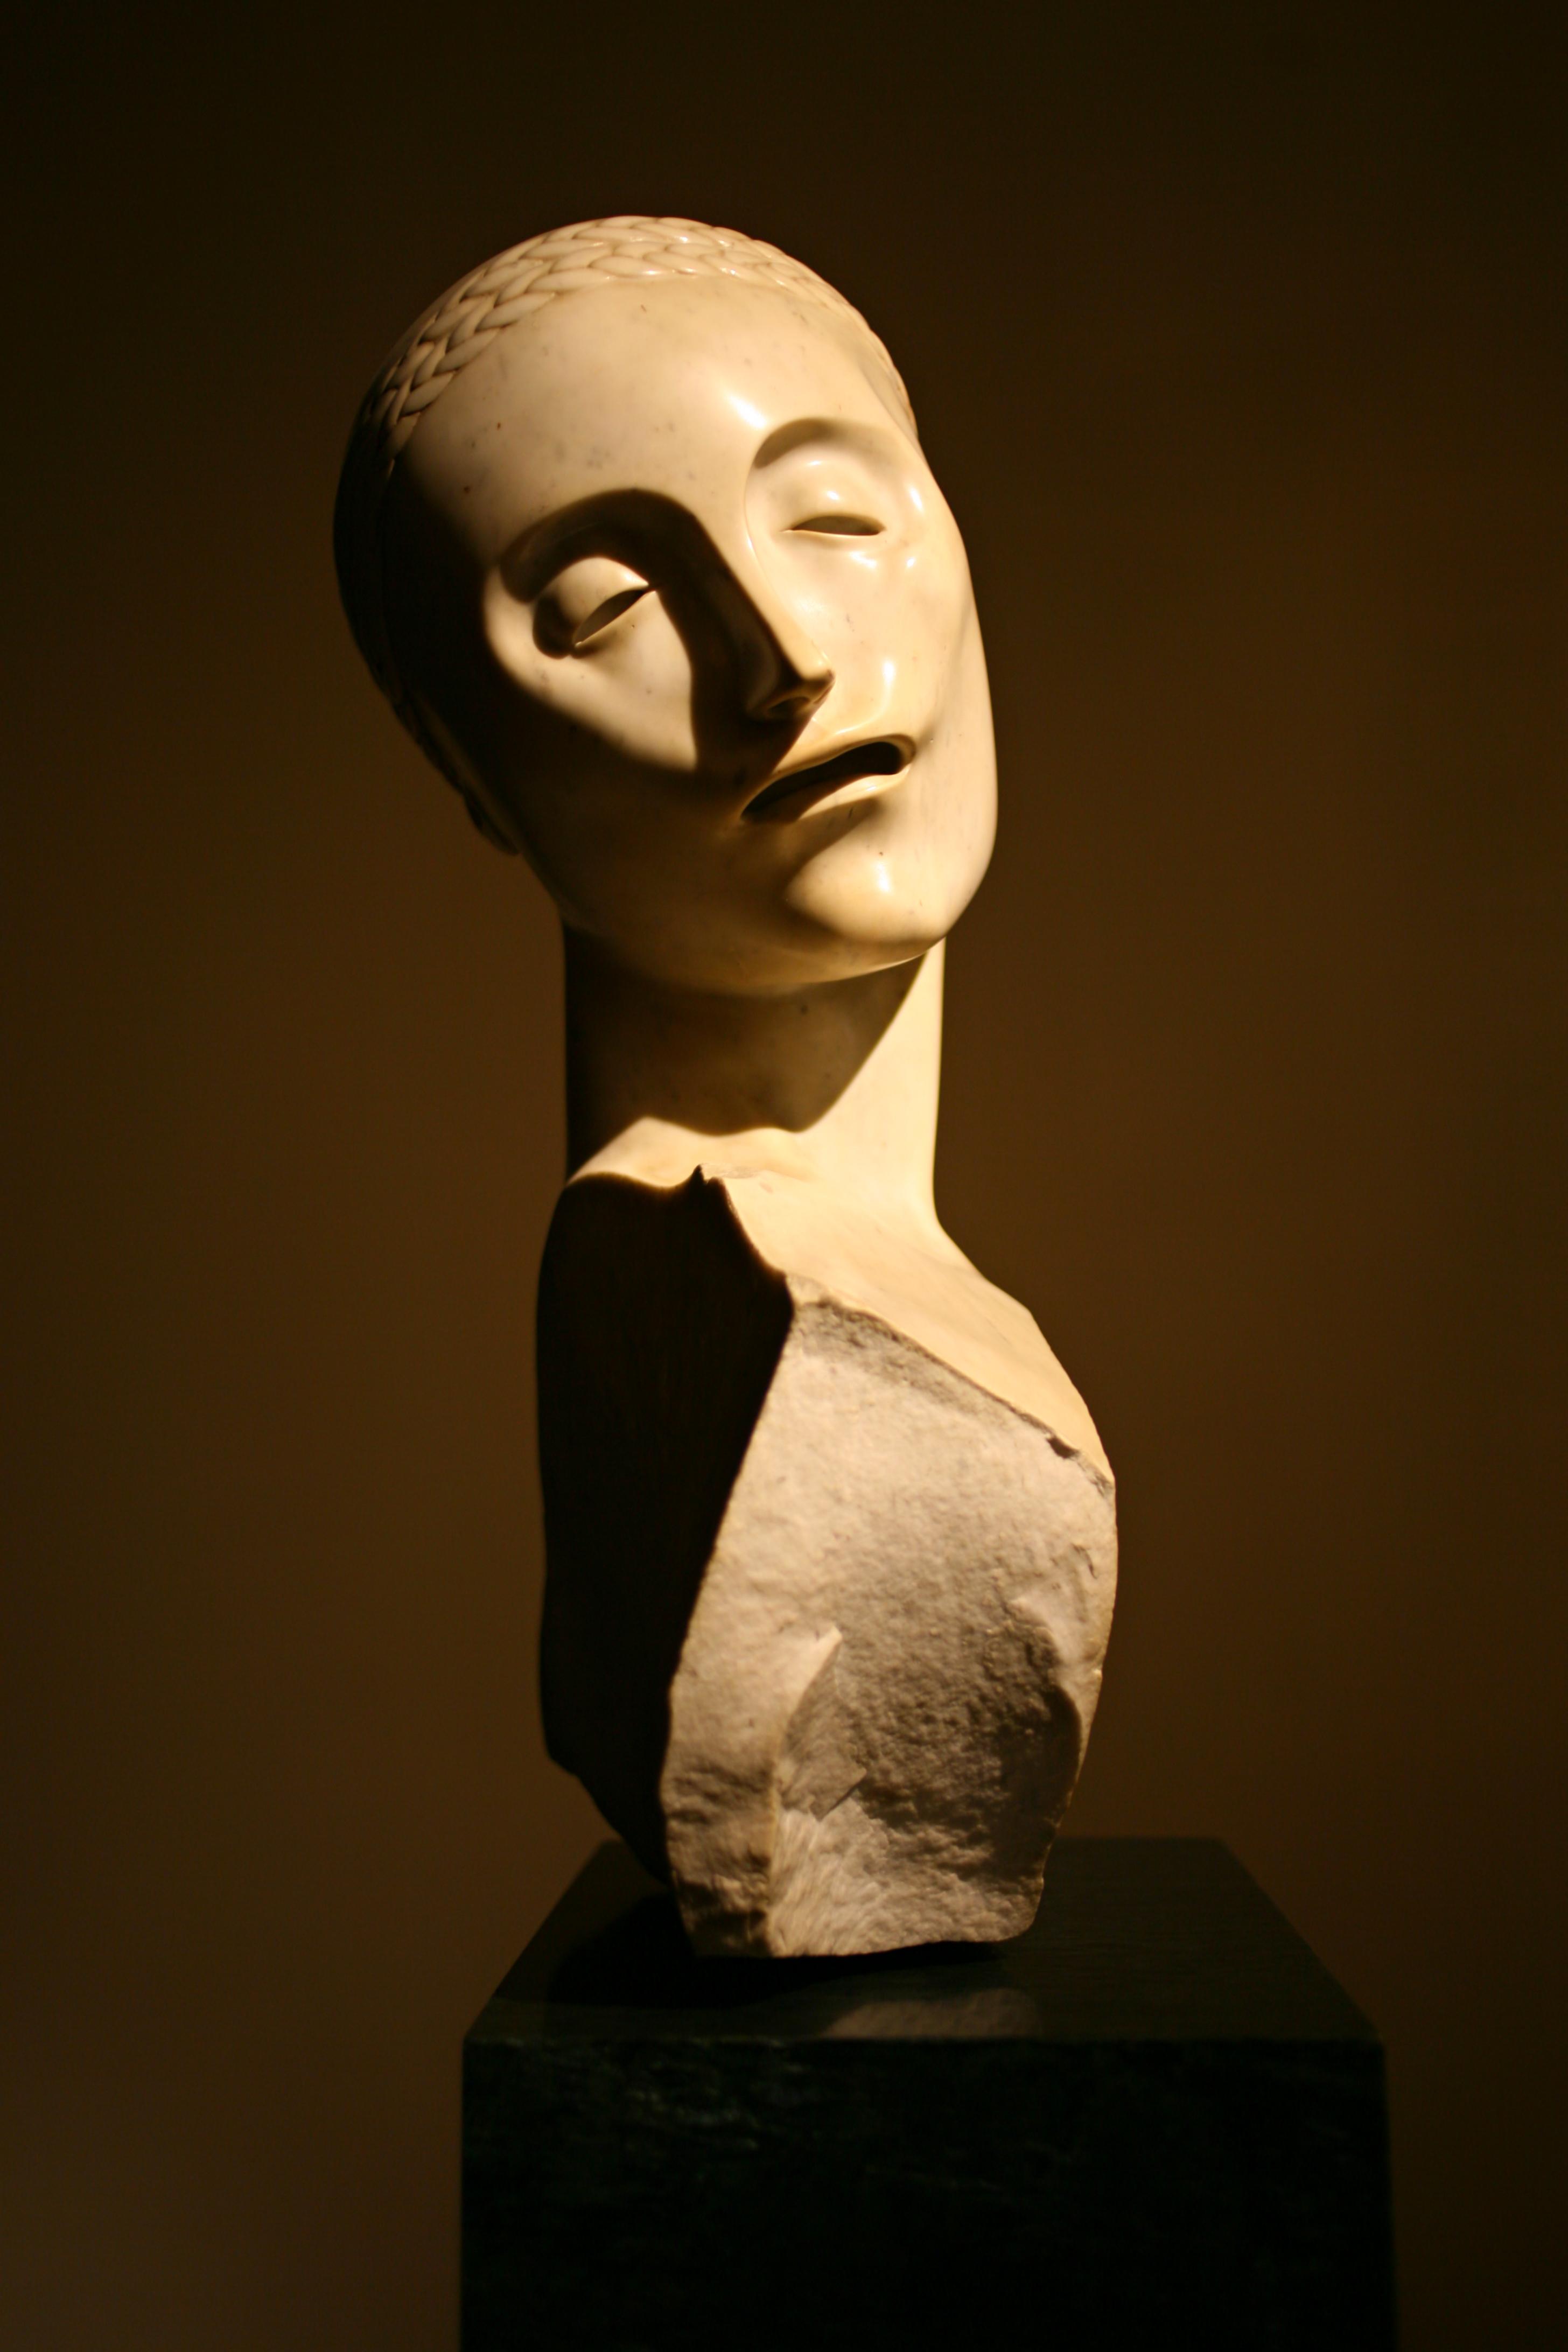 File:Adolfo Wildt (1868-1931) Madre 1 (1922).jpg